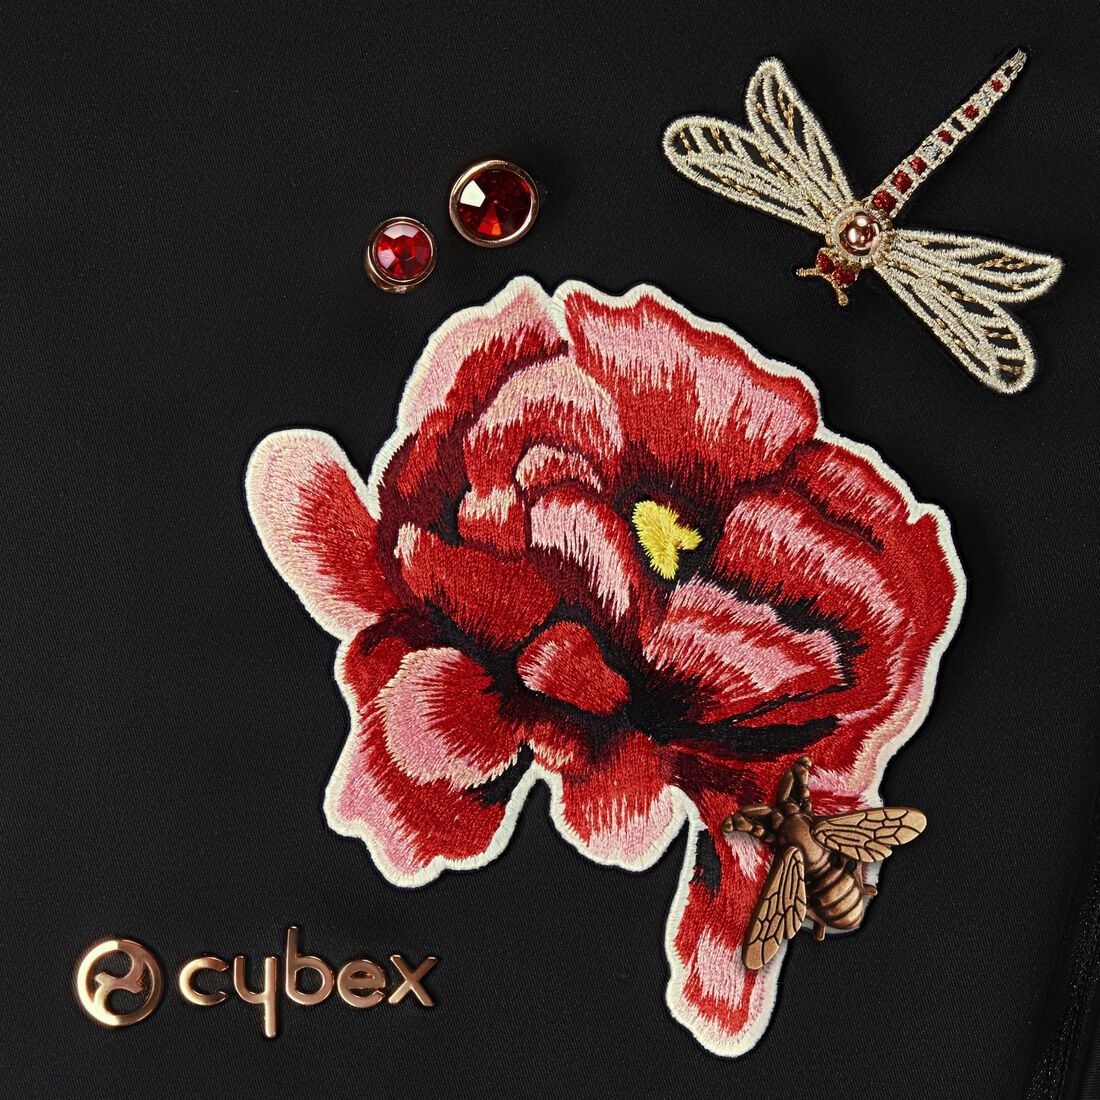 CYBEX Platinum Fußsack - Spring Blossom Dark in Spring Blossom Dark large Bild 3